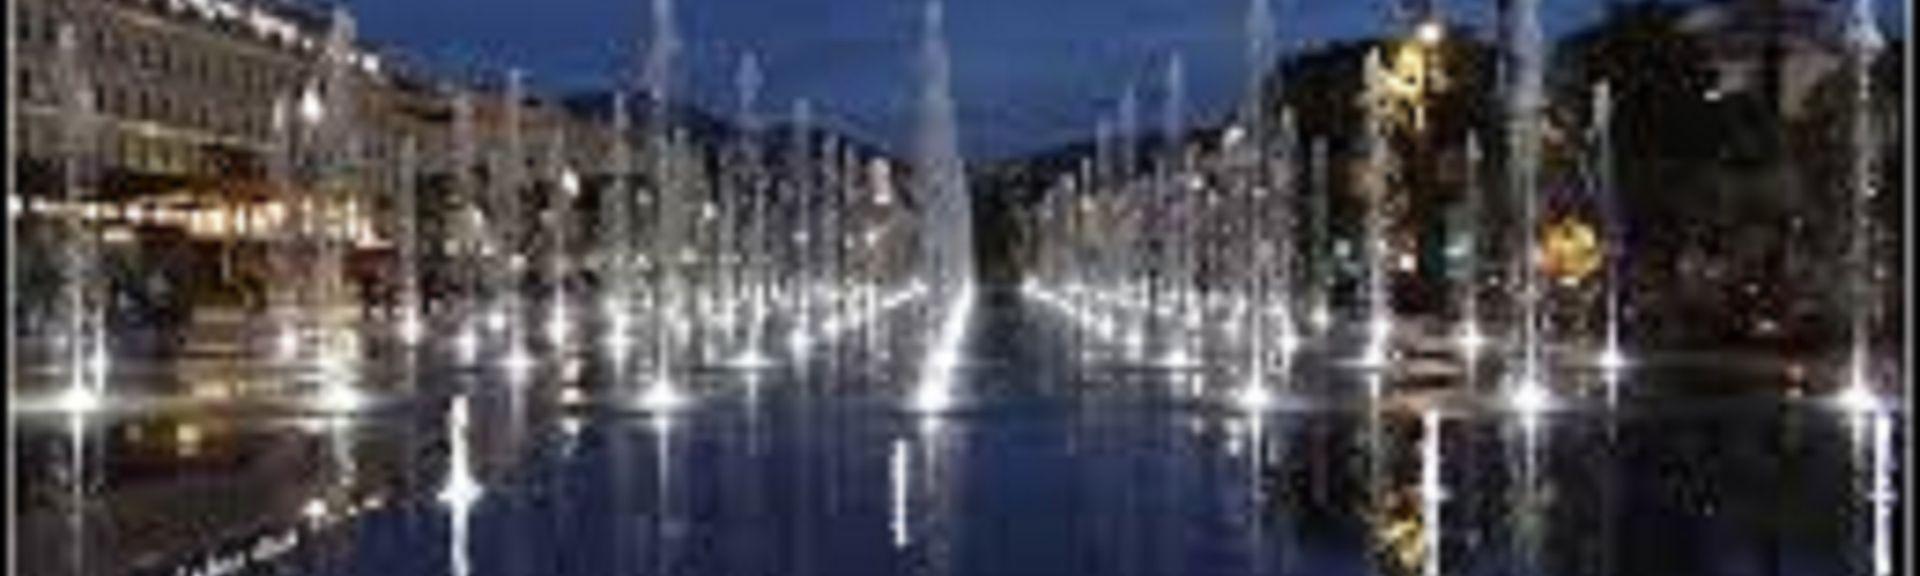 Gambetta, Nice, PACA, France